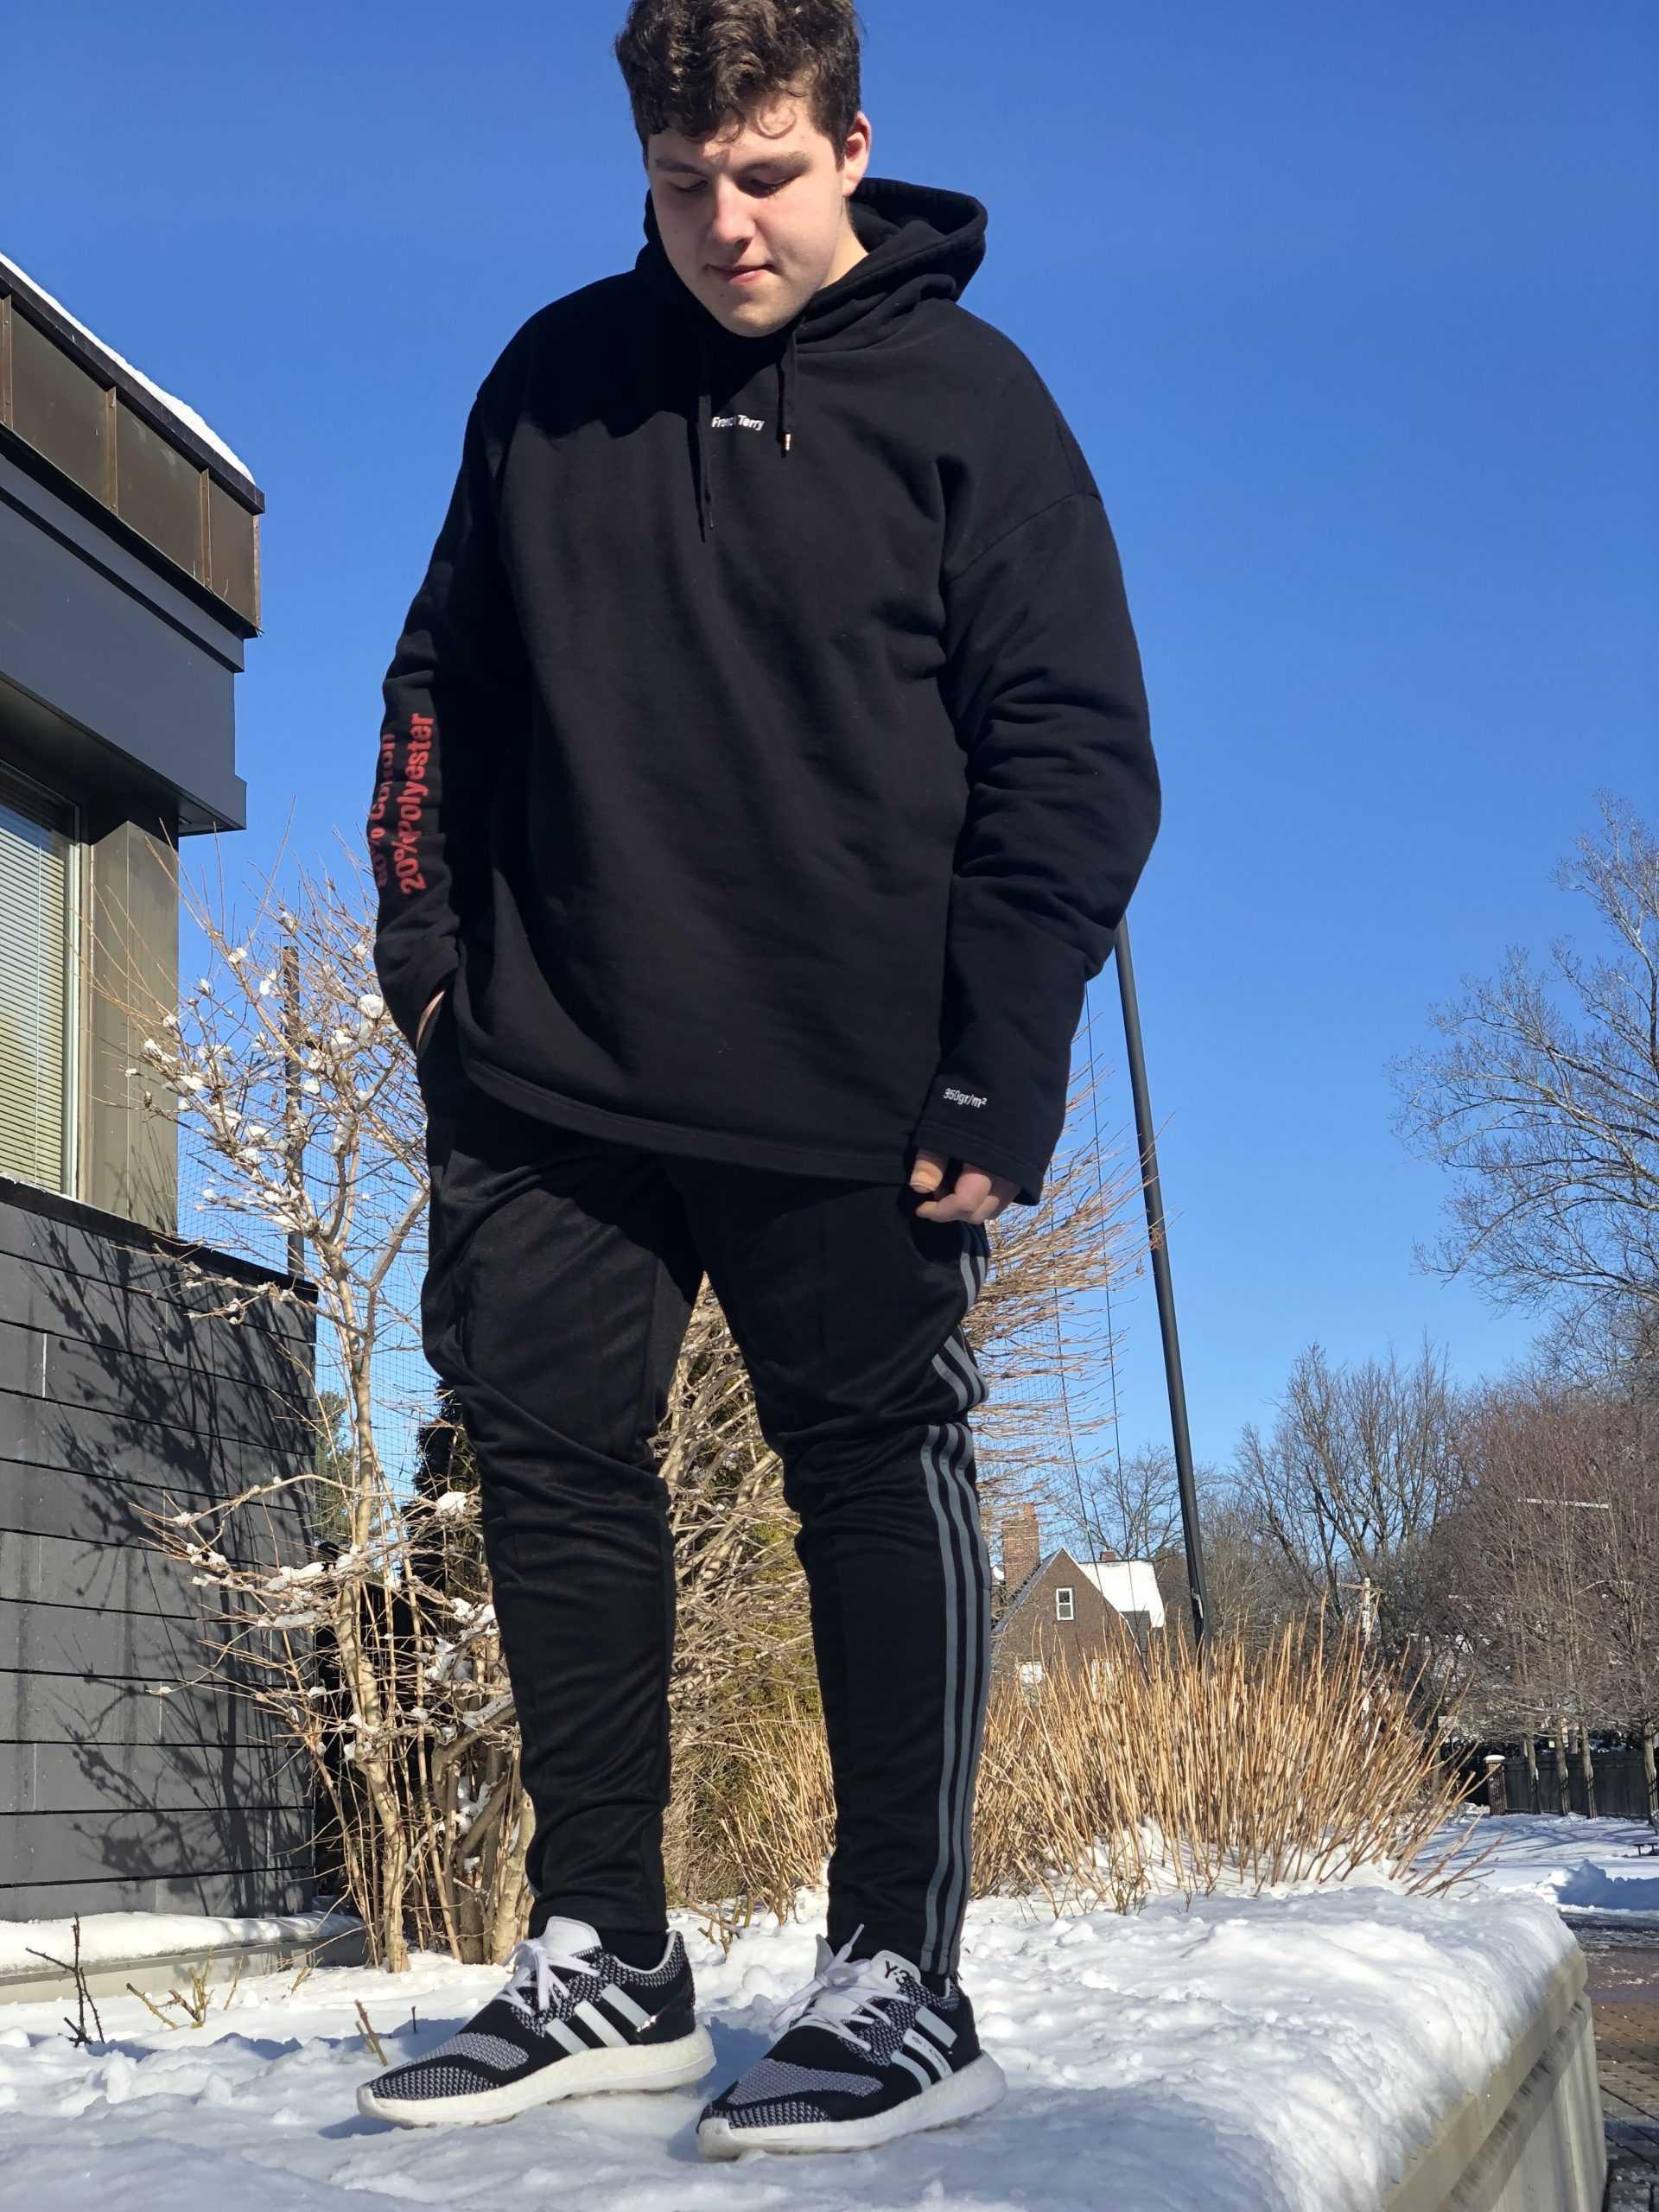 Cole+Morad+19+reflects+on+his+fashion+sense.%0A